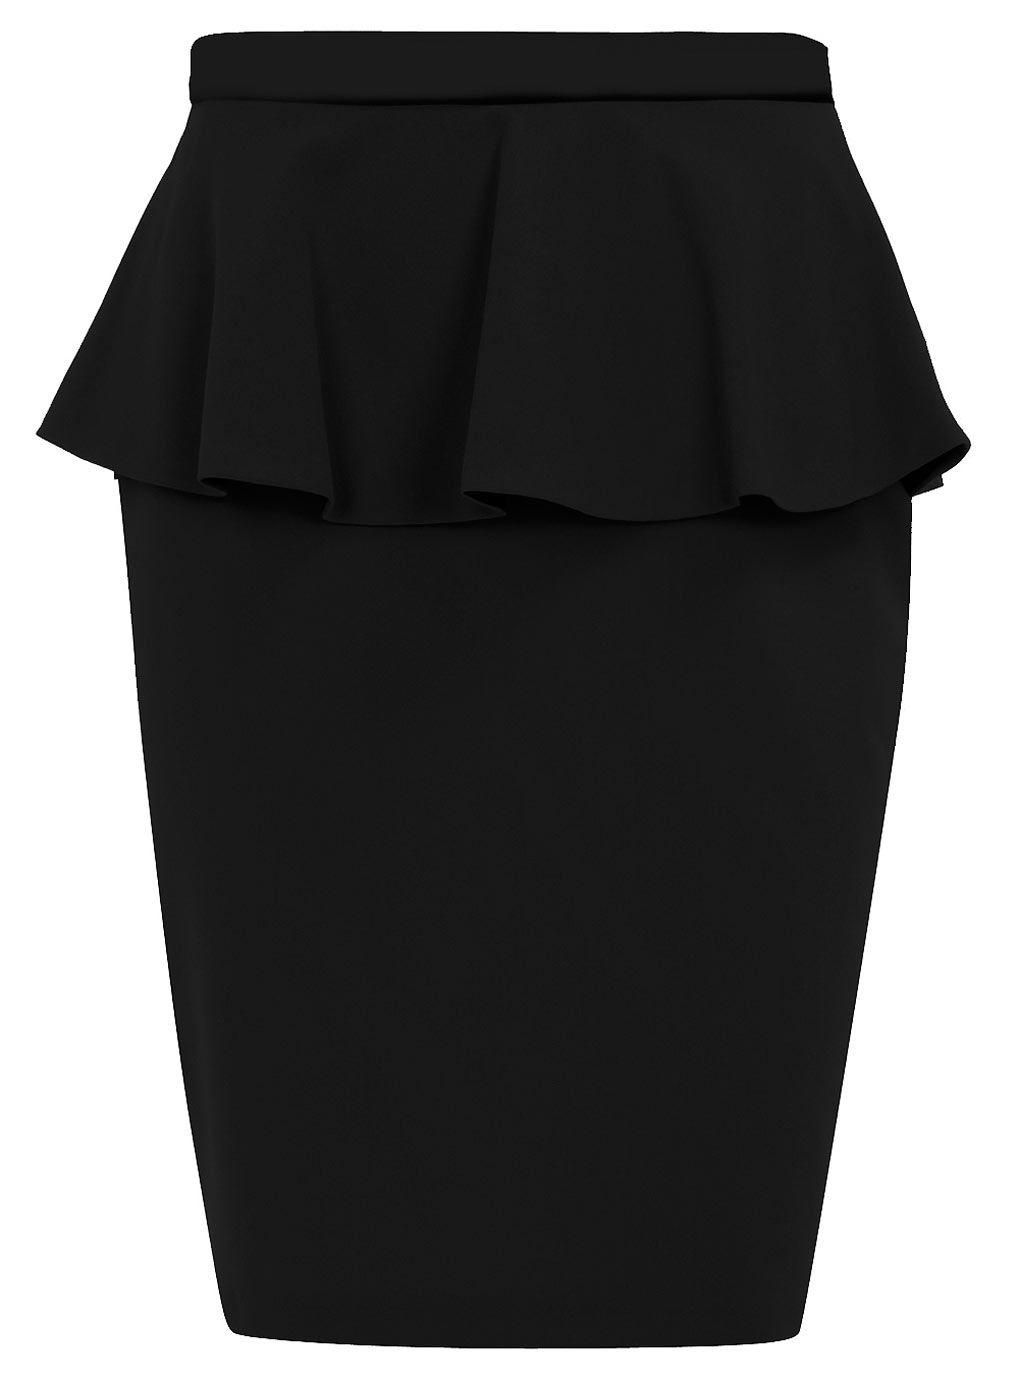 76ae630150097d H & M Peplum Pencil Skirt | Very stylish black peplum skirt made of really  flattering material.